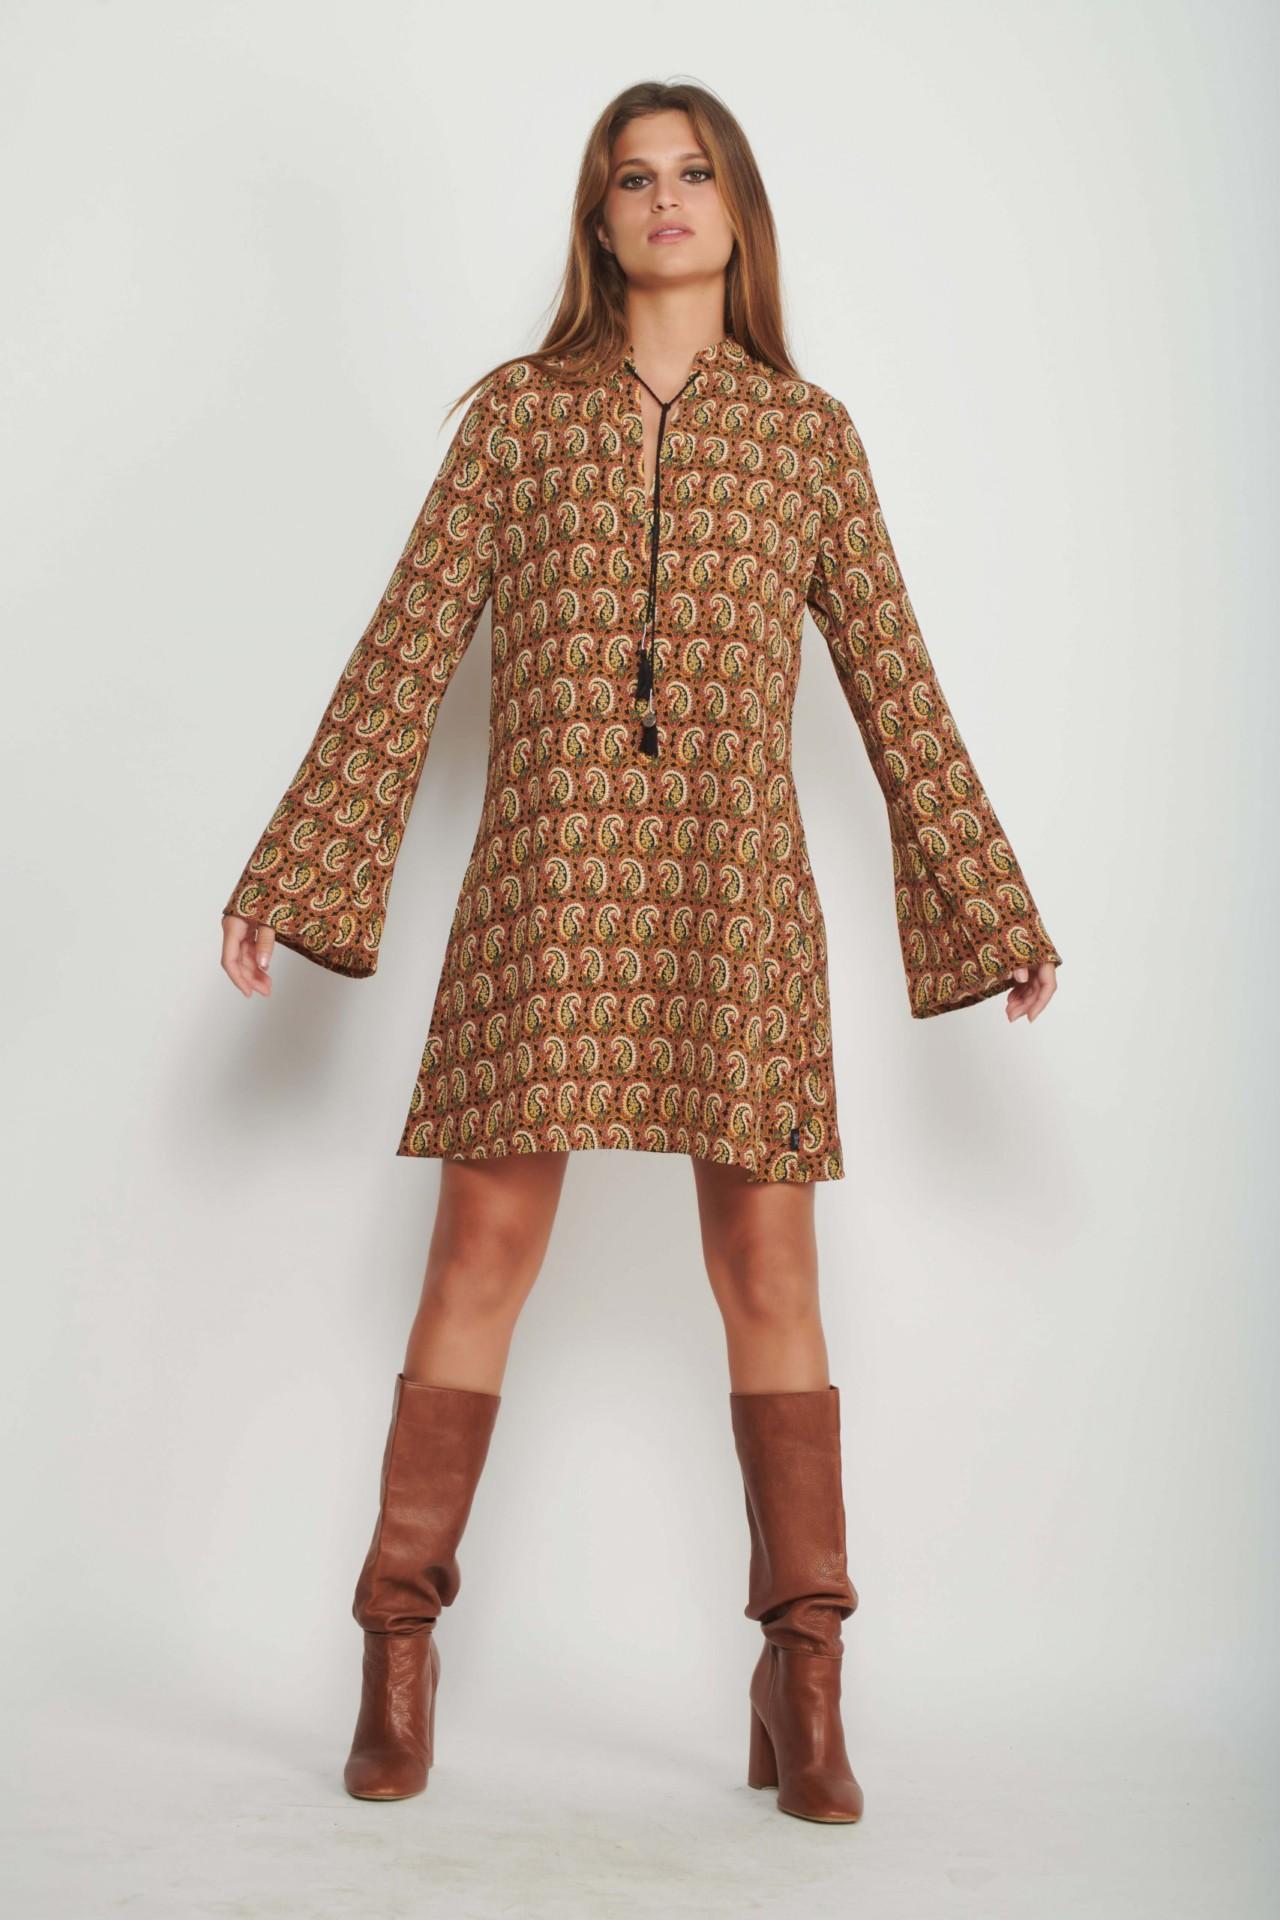 Retro Paisley Dress for Women